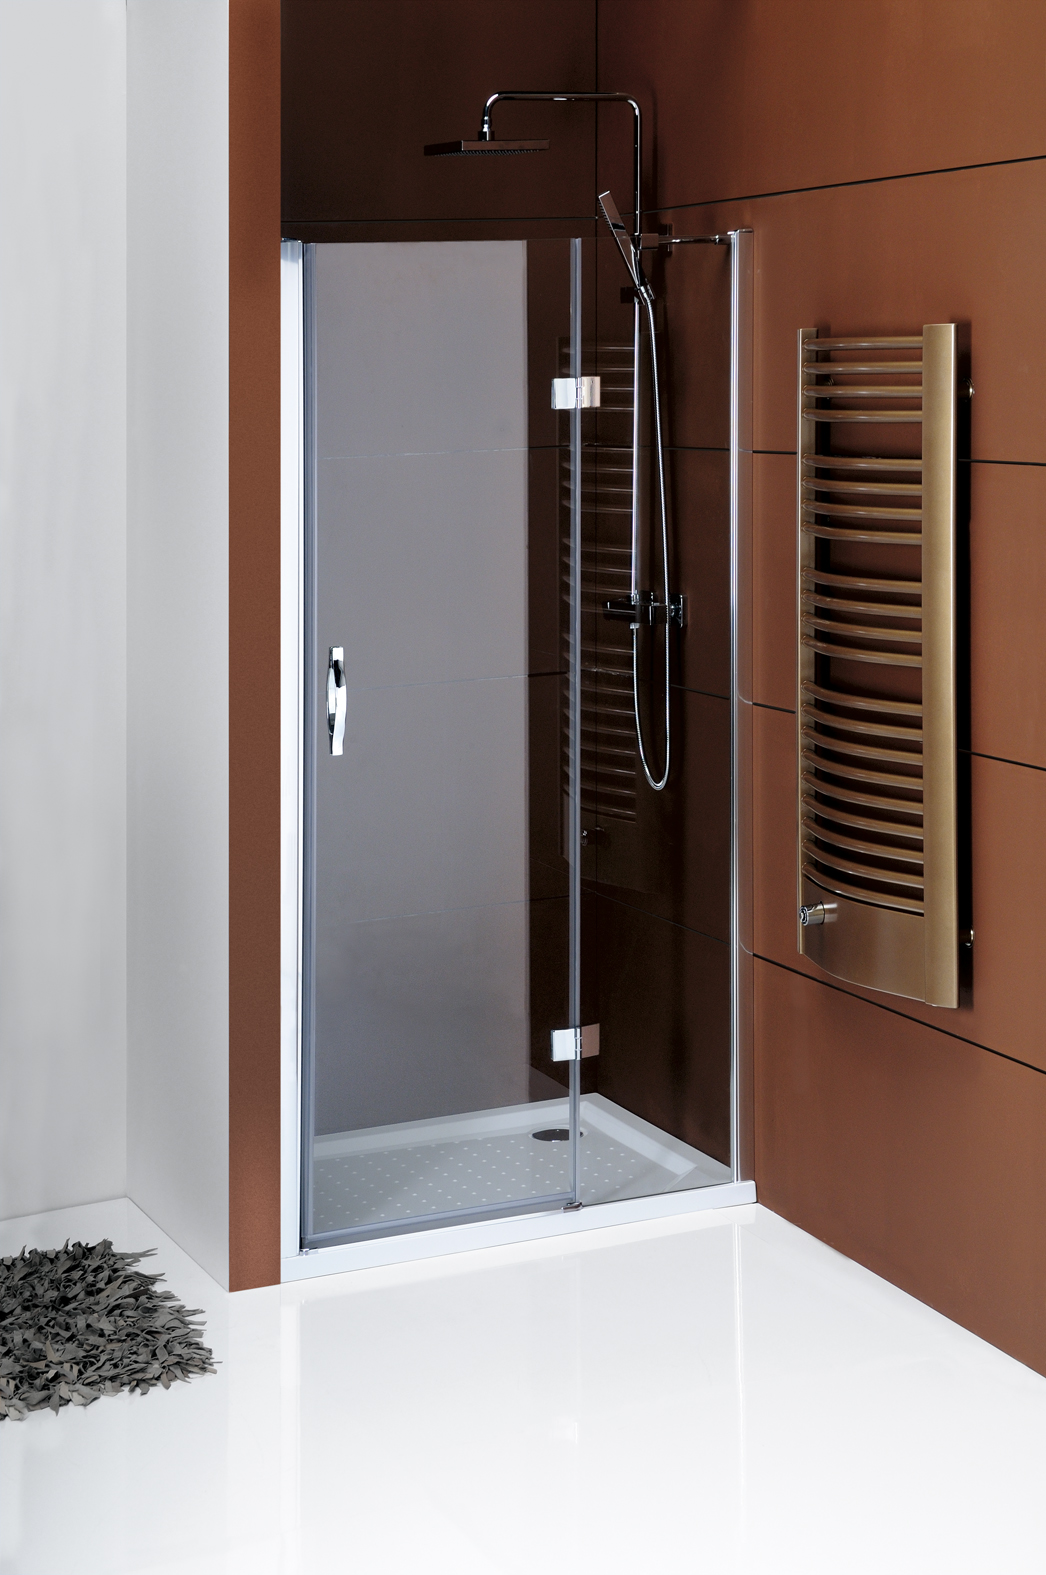 Gelco Sprchové dveře Legro do niky jednodílné otočné 110 cm, sklo čiré/leštěný profil GL1211